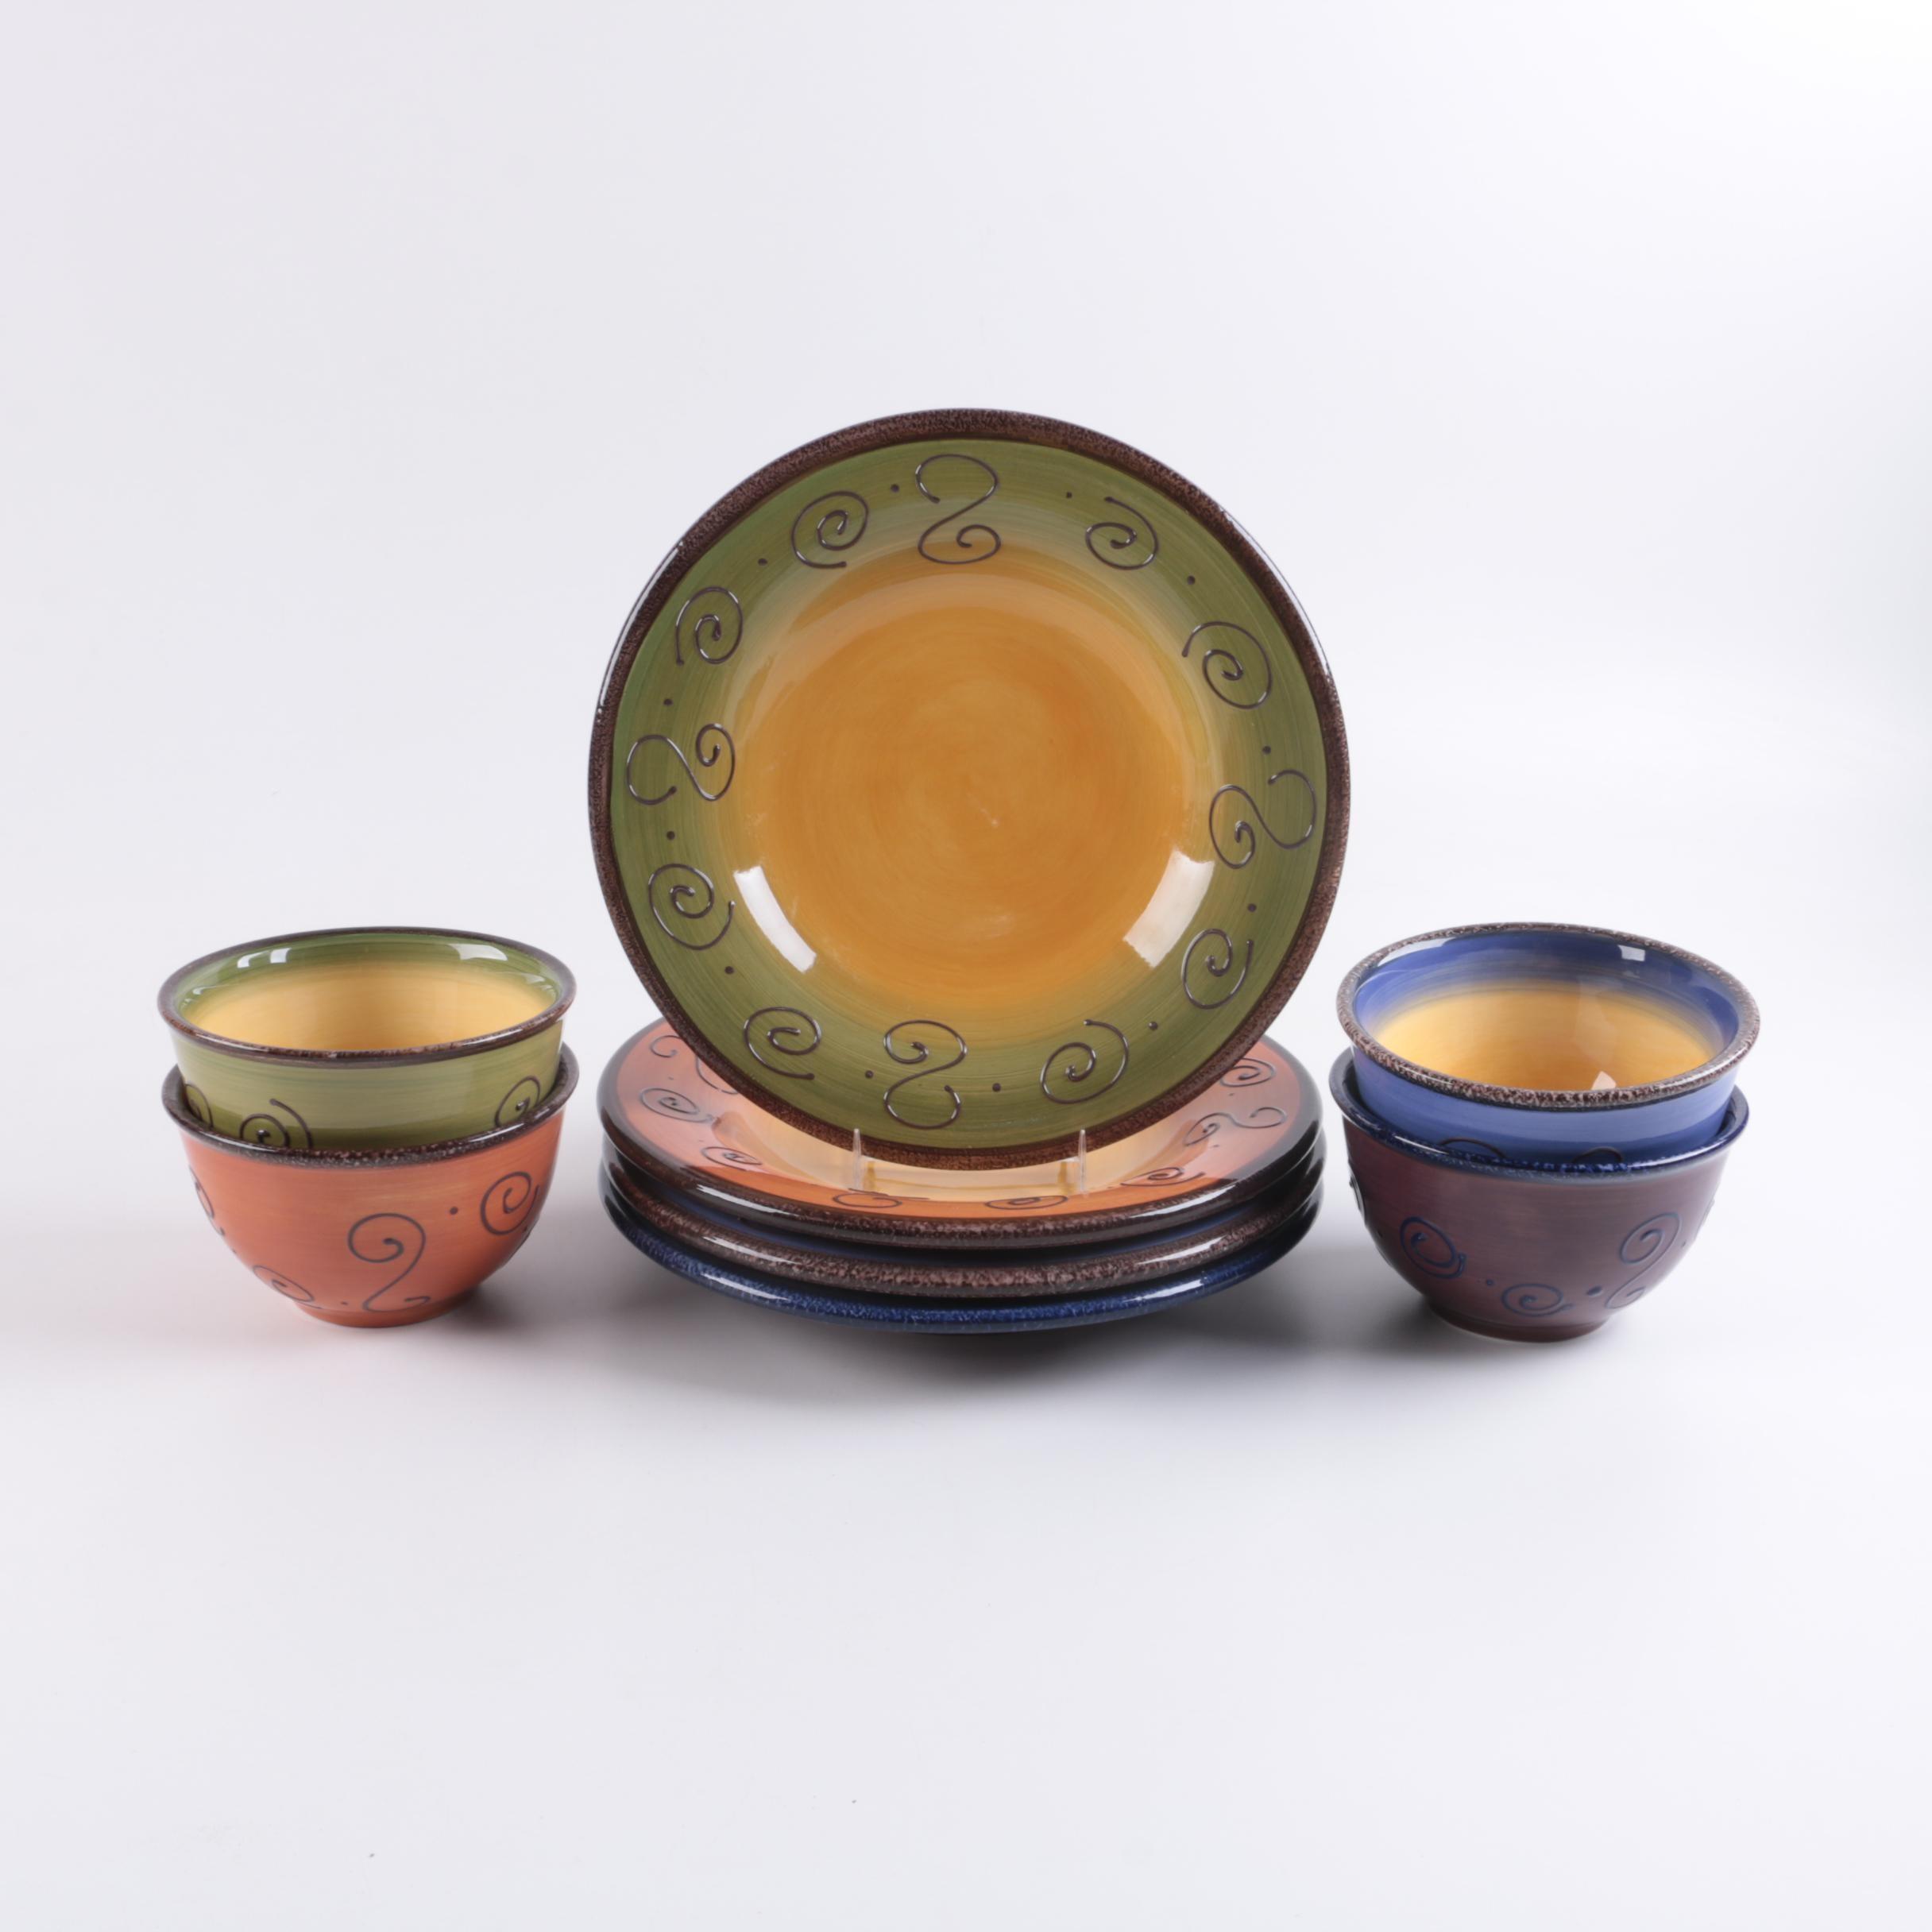 Ambrosia Hand Painted Ceramic Dinnerware